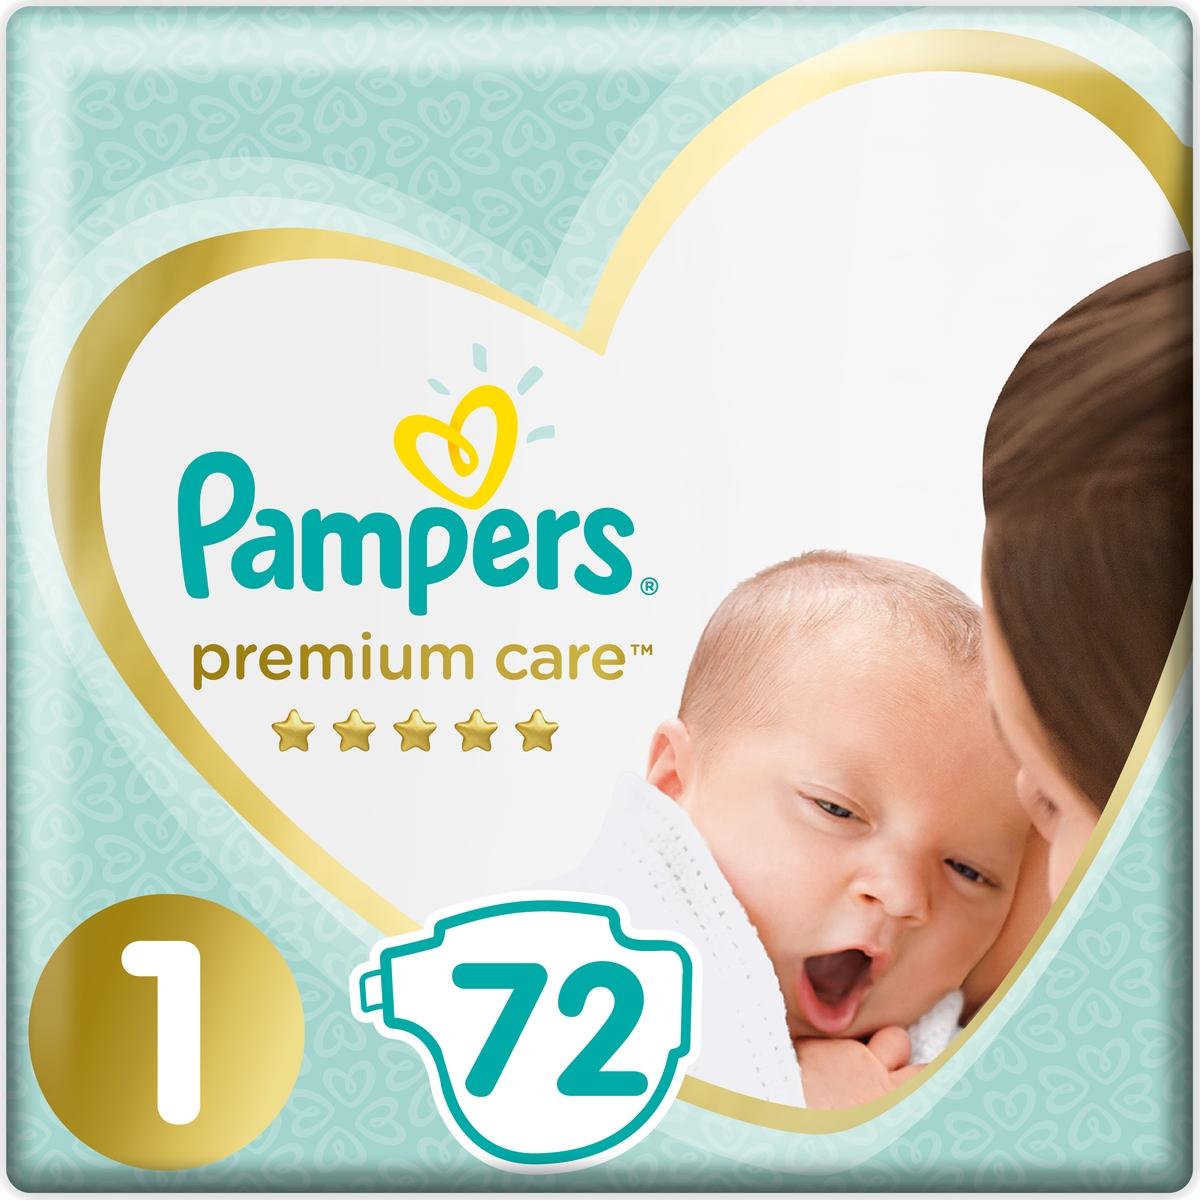 Pampers Подгузники Premium Care 2-5 кг (размер 1) 72 шт подгузники pampers premium care 5 11 кг 42 шт